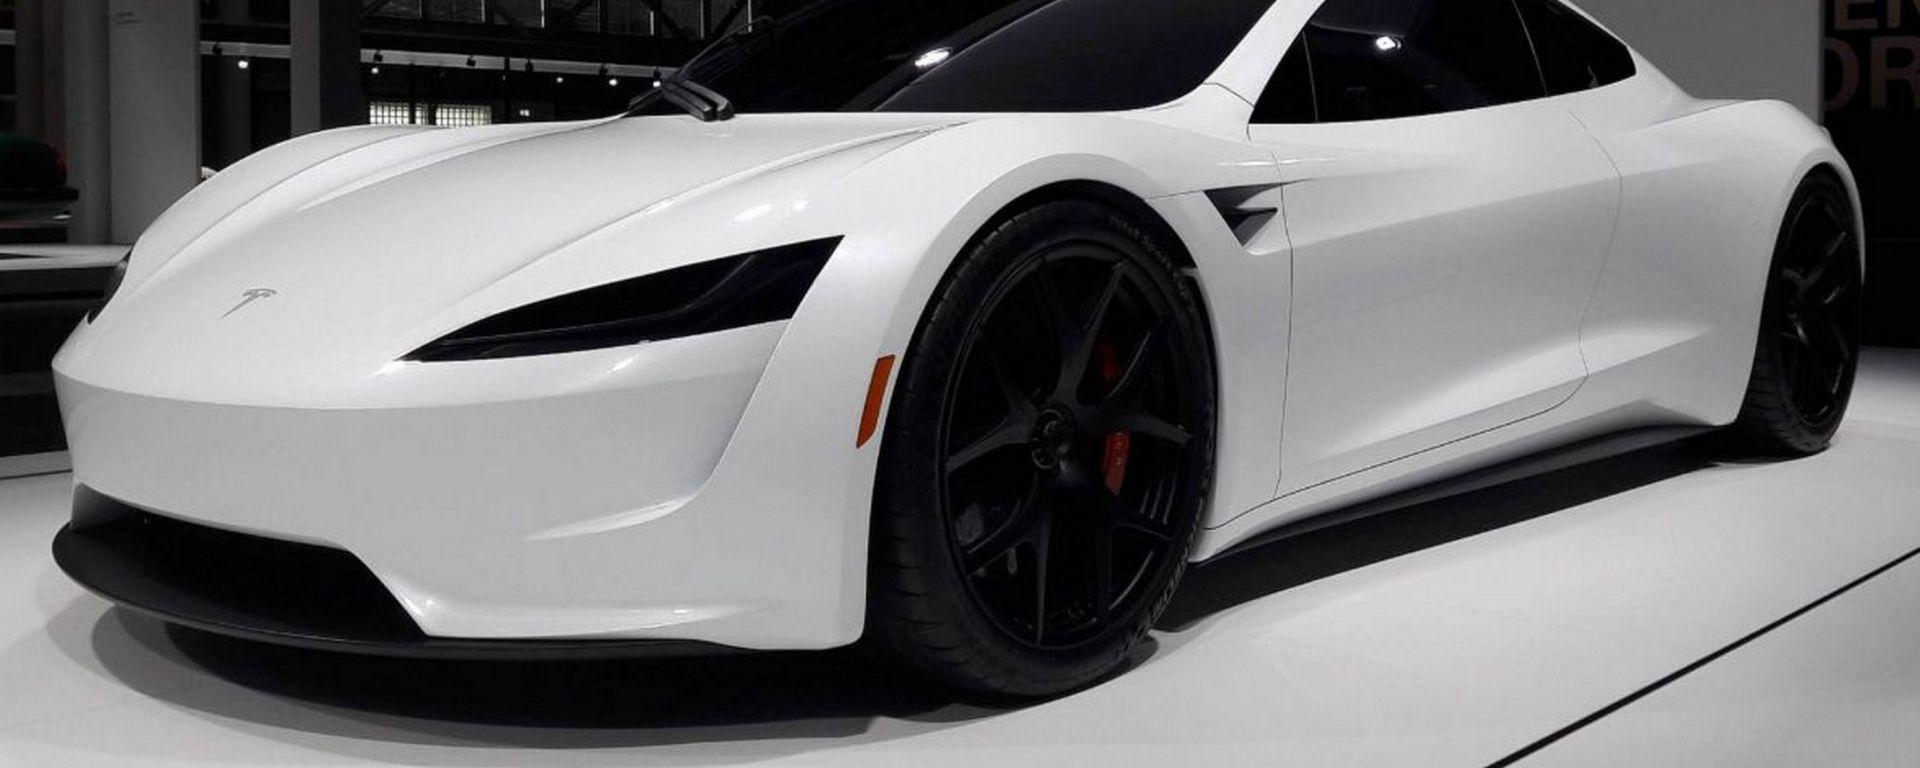 Nuova Tesla Roadster, Musk: «Volerà davvero»